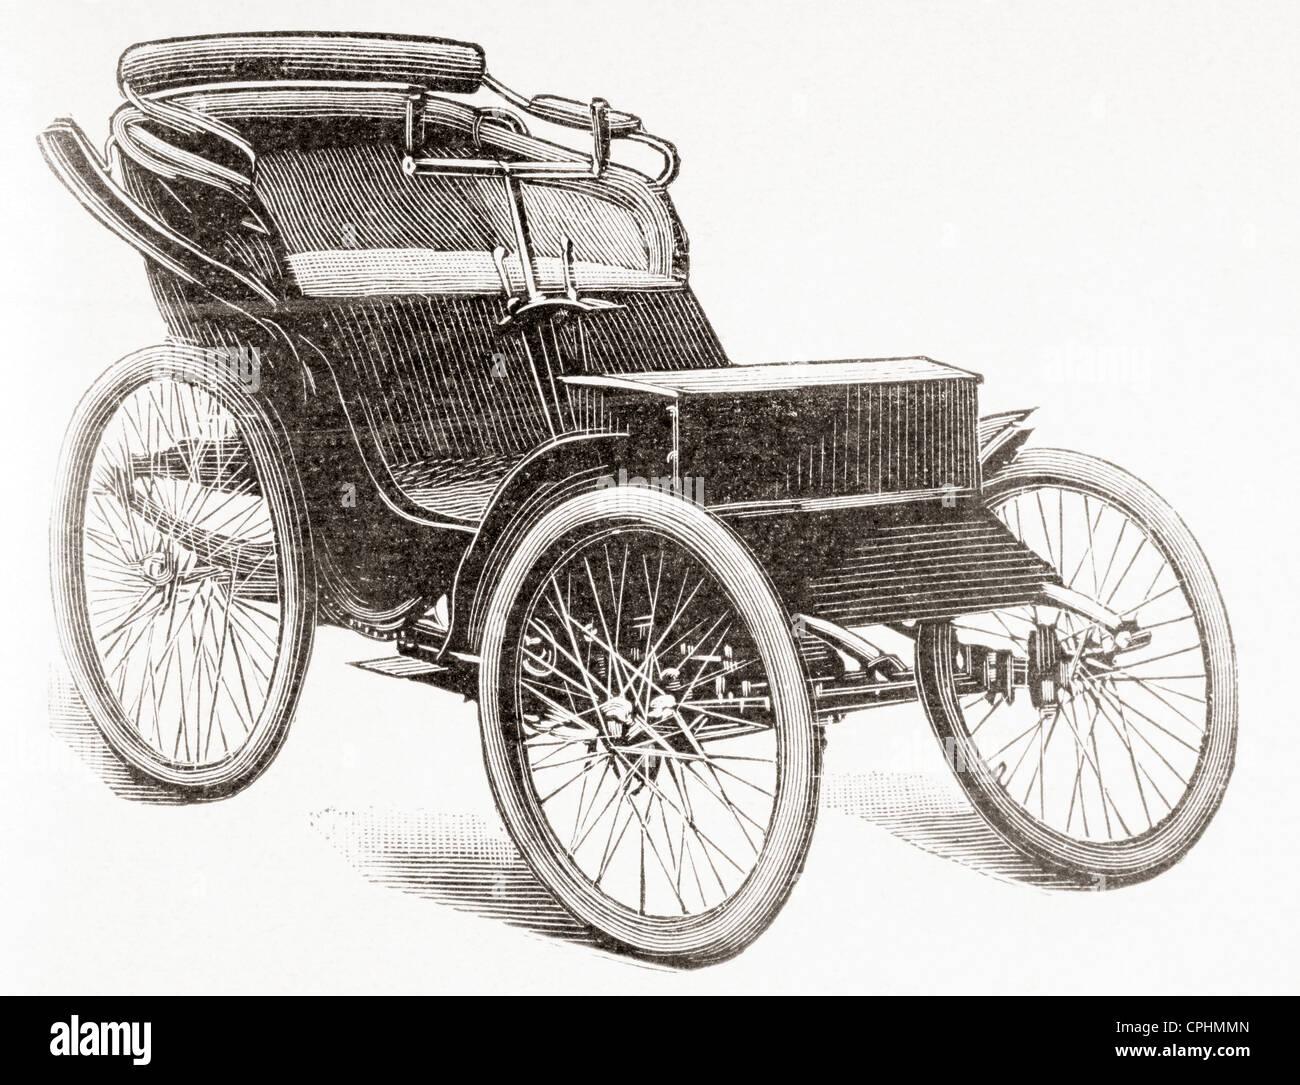 An early petrol driven Clément motor car. - Stock Image